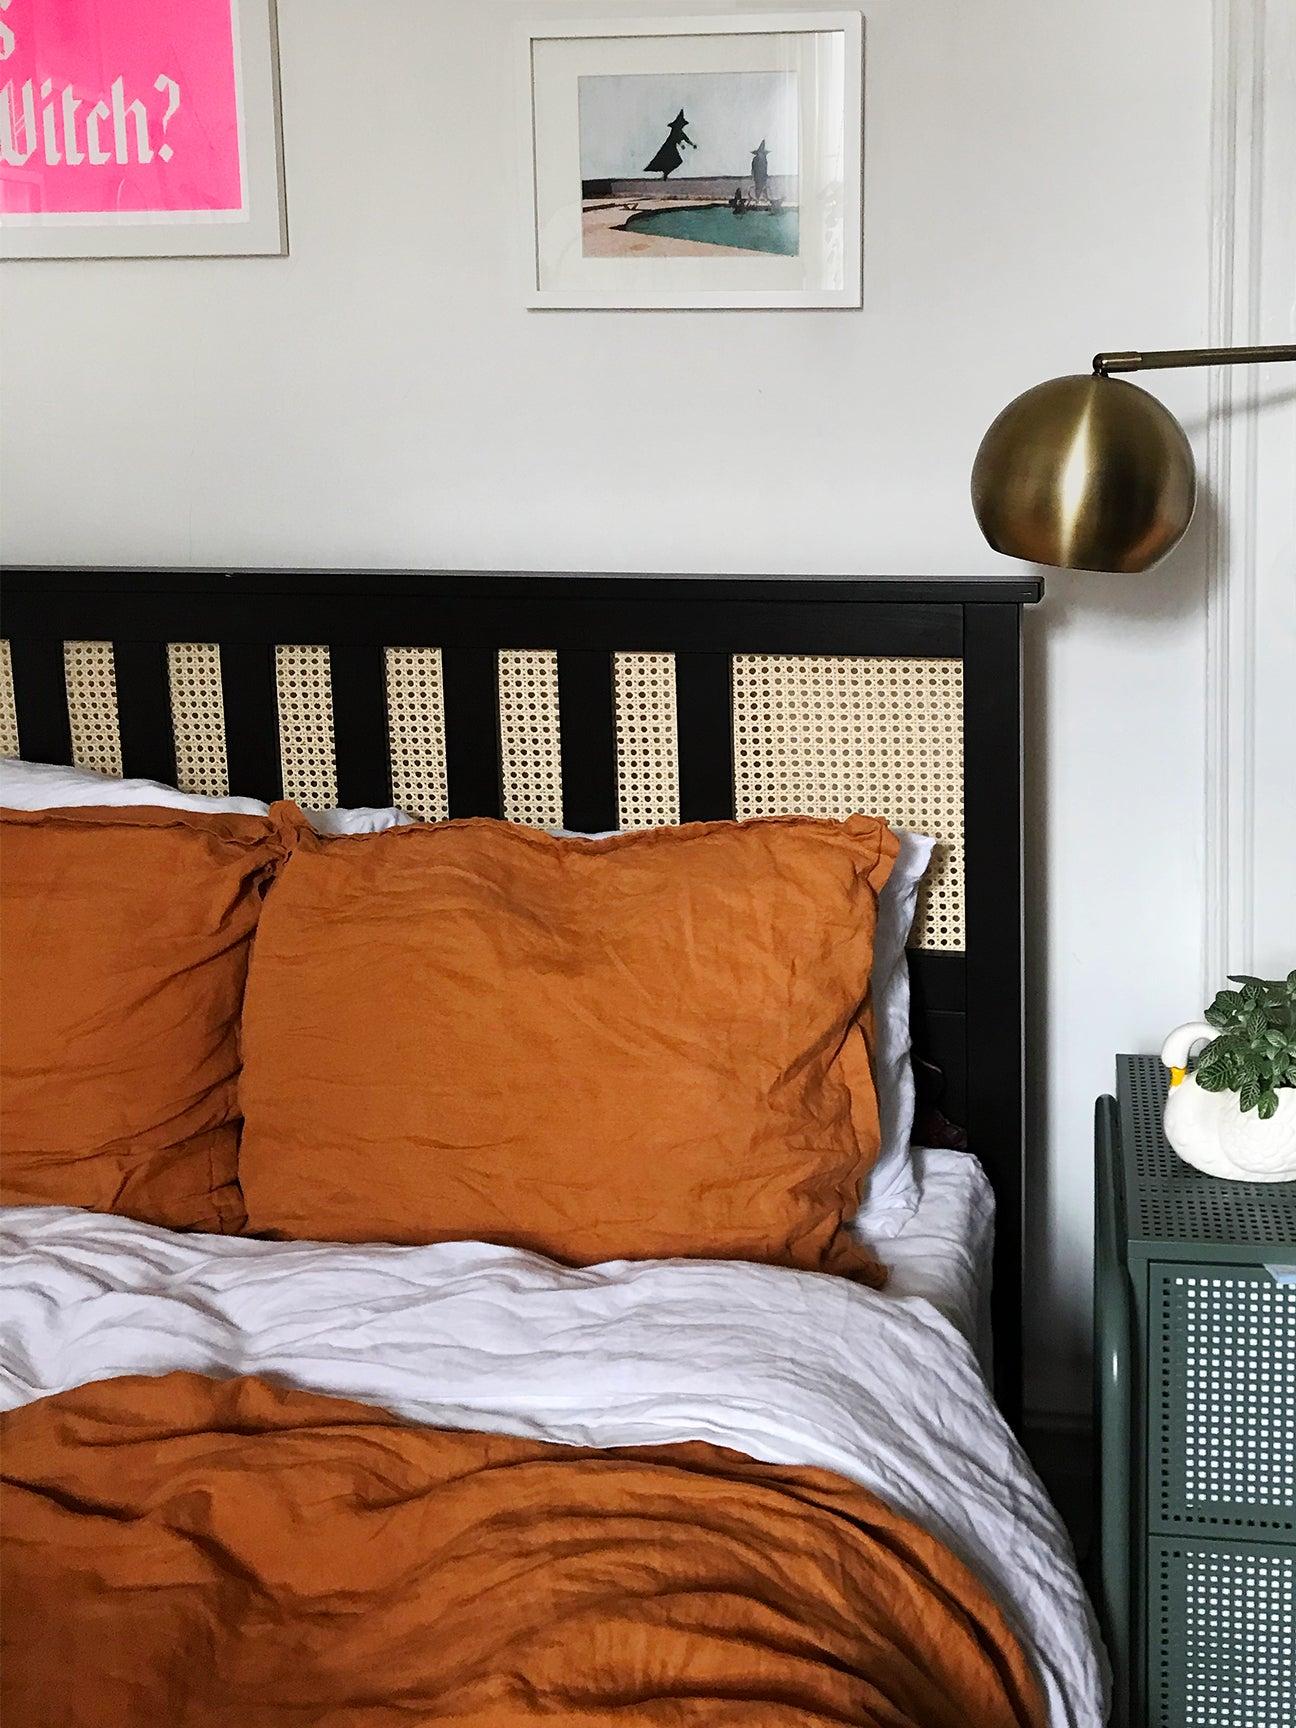 Ikea Hemnes Bedbank.This Ikea Hemnes Bed Hack Takes Just 10 Minutes